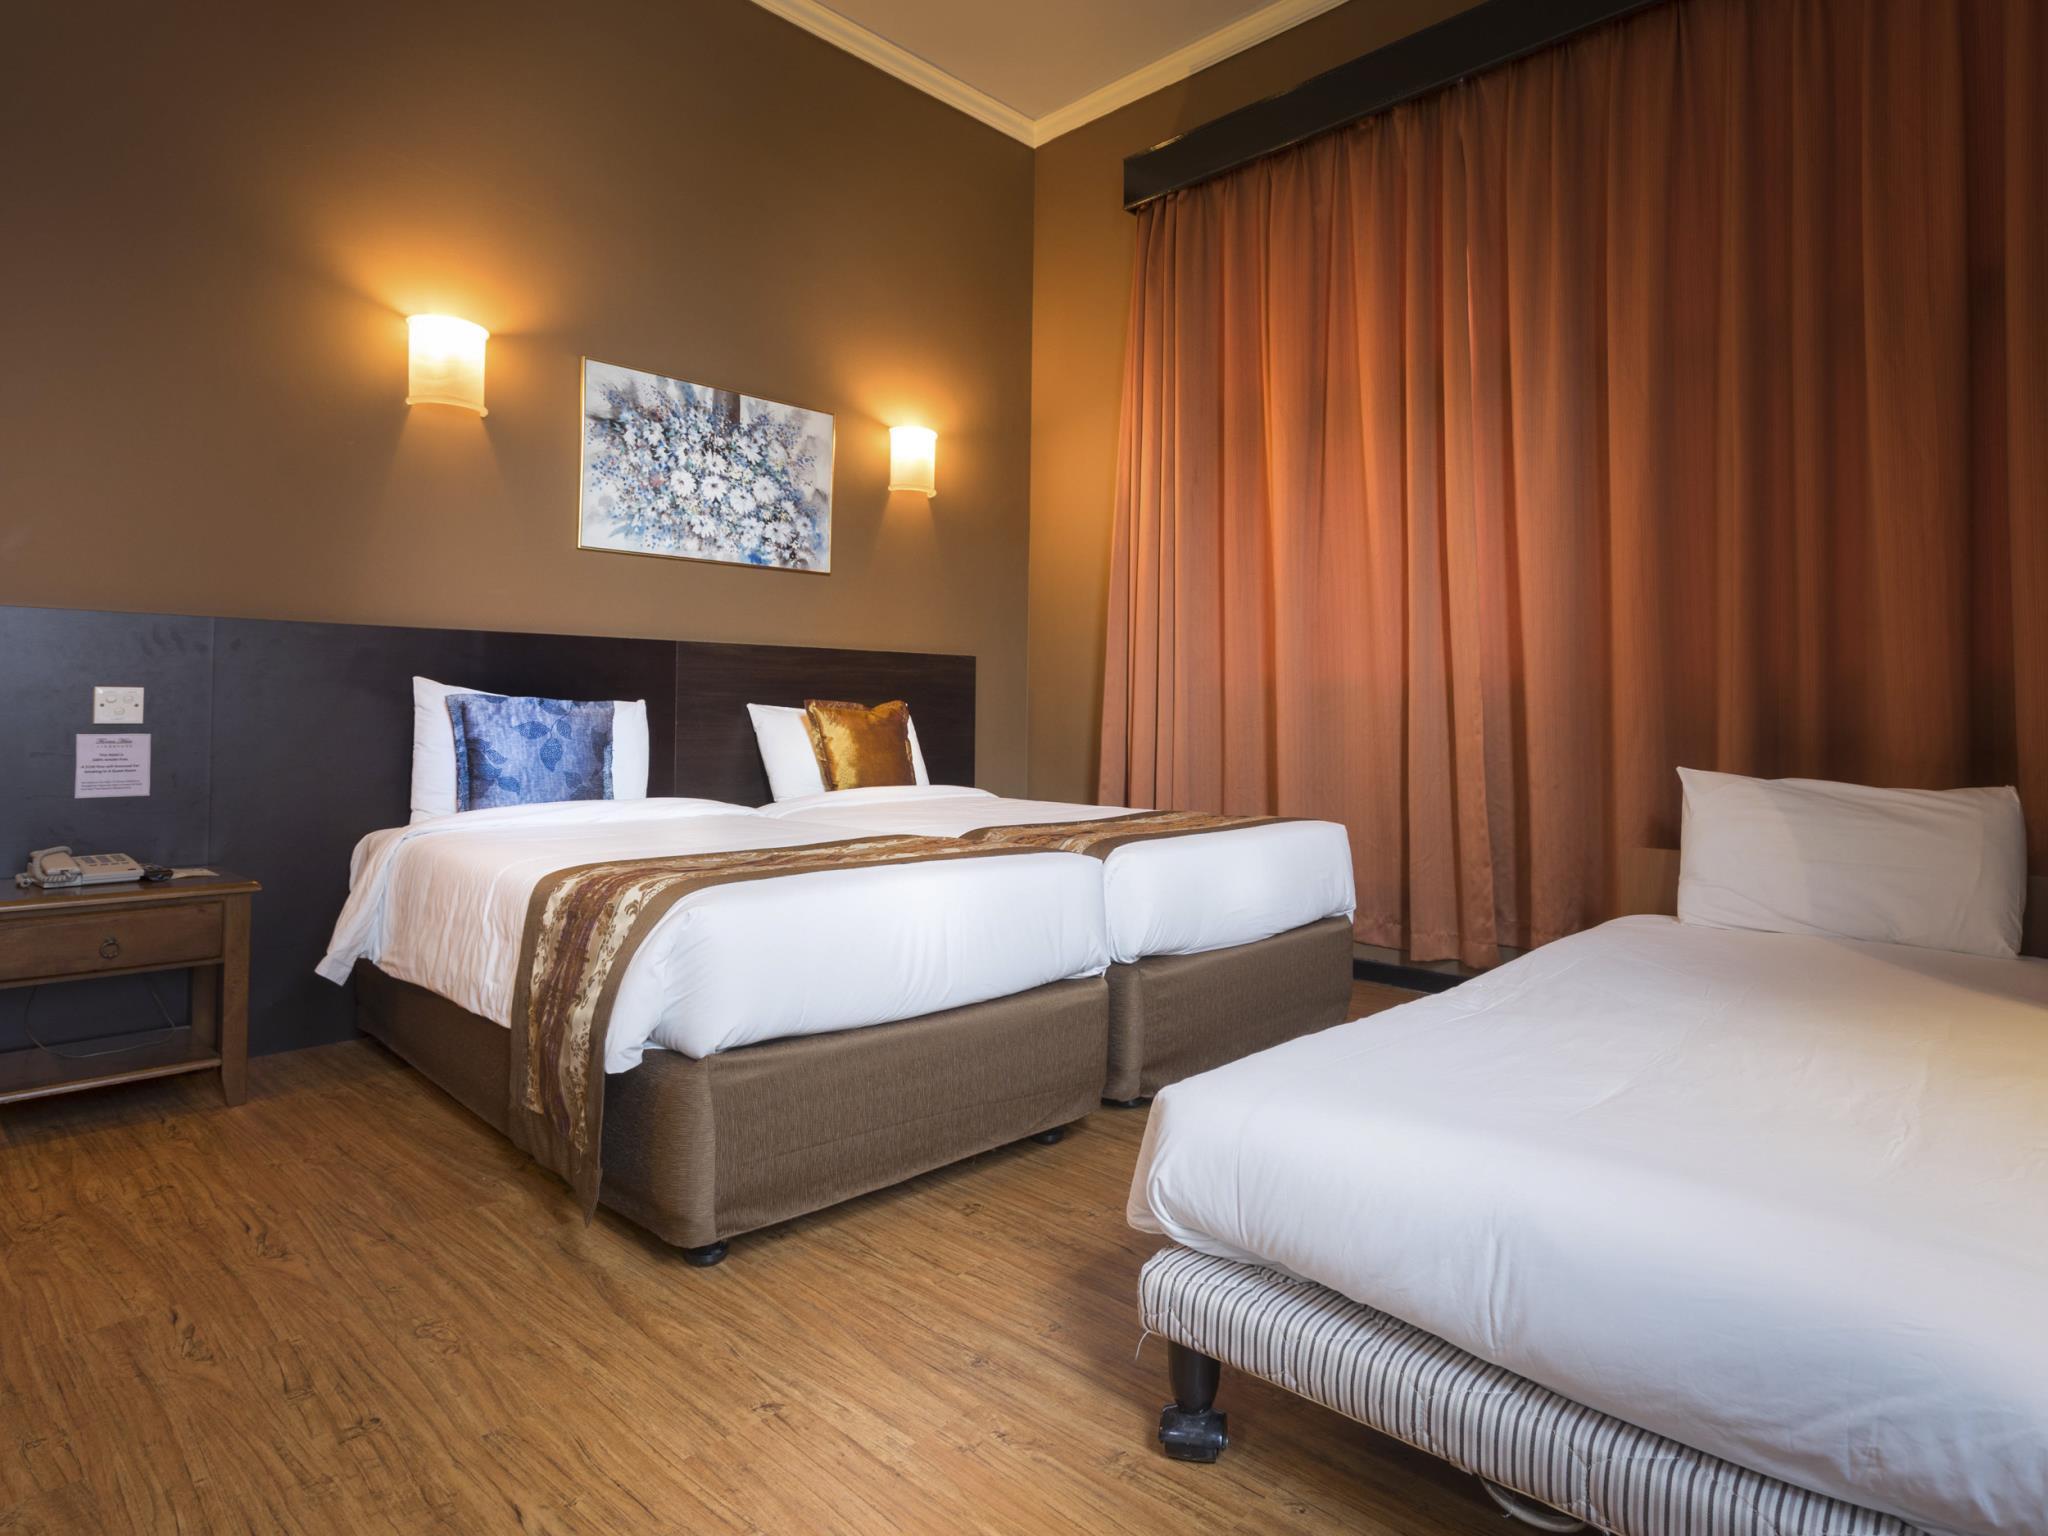 Mudahnya Sewa Hotel Secara Online